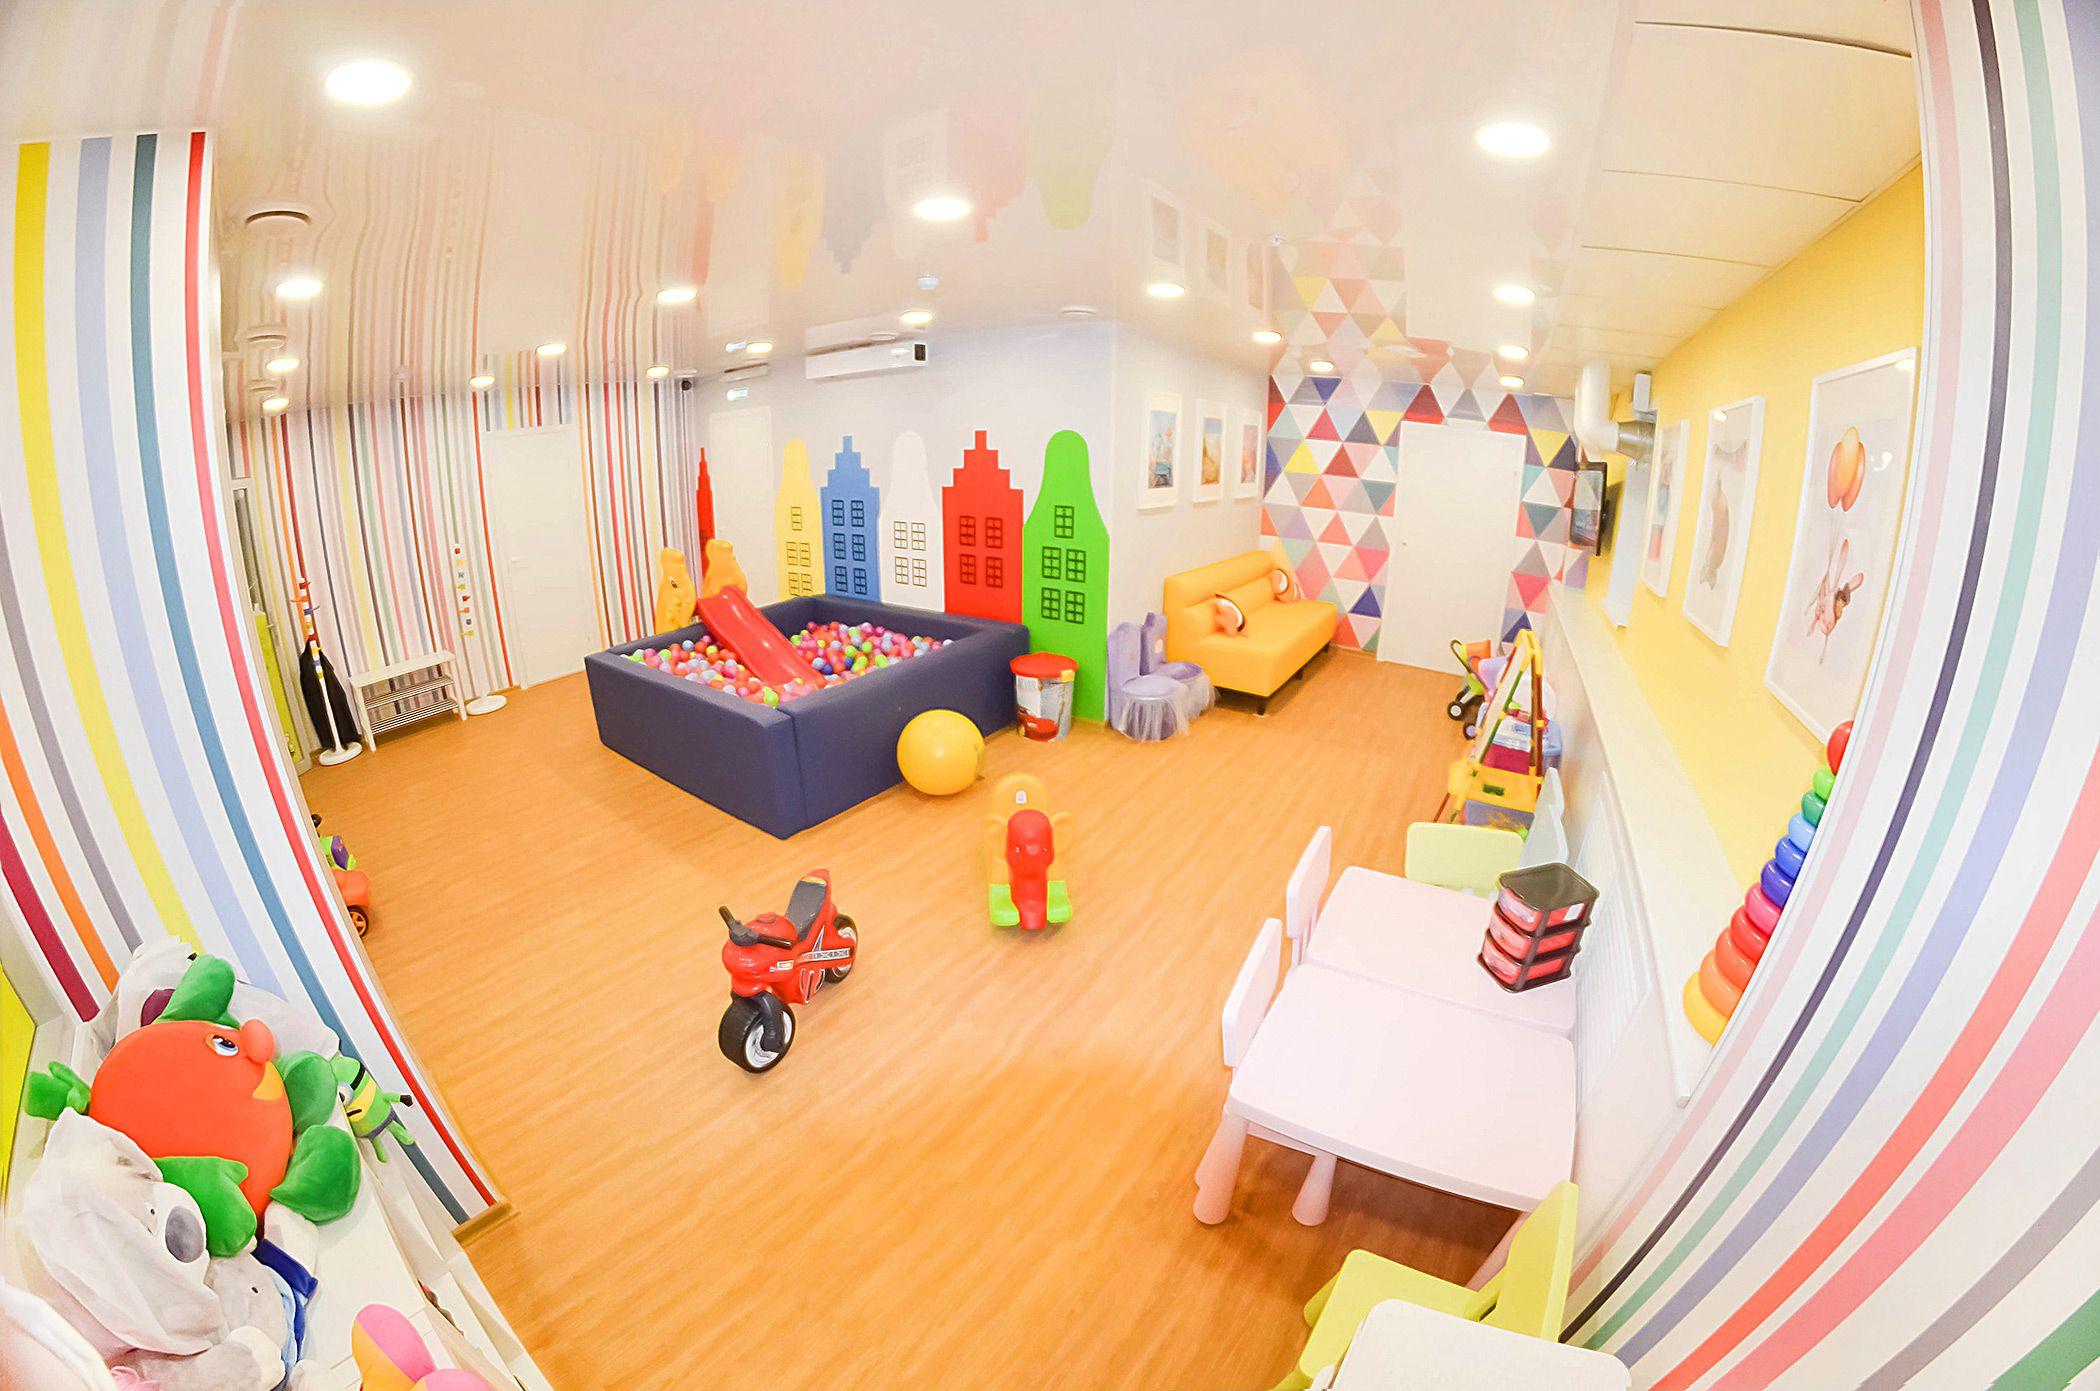 Kids Rooms, Child Room, Kidsroom, Play Rooms, Room Kids, Baby